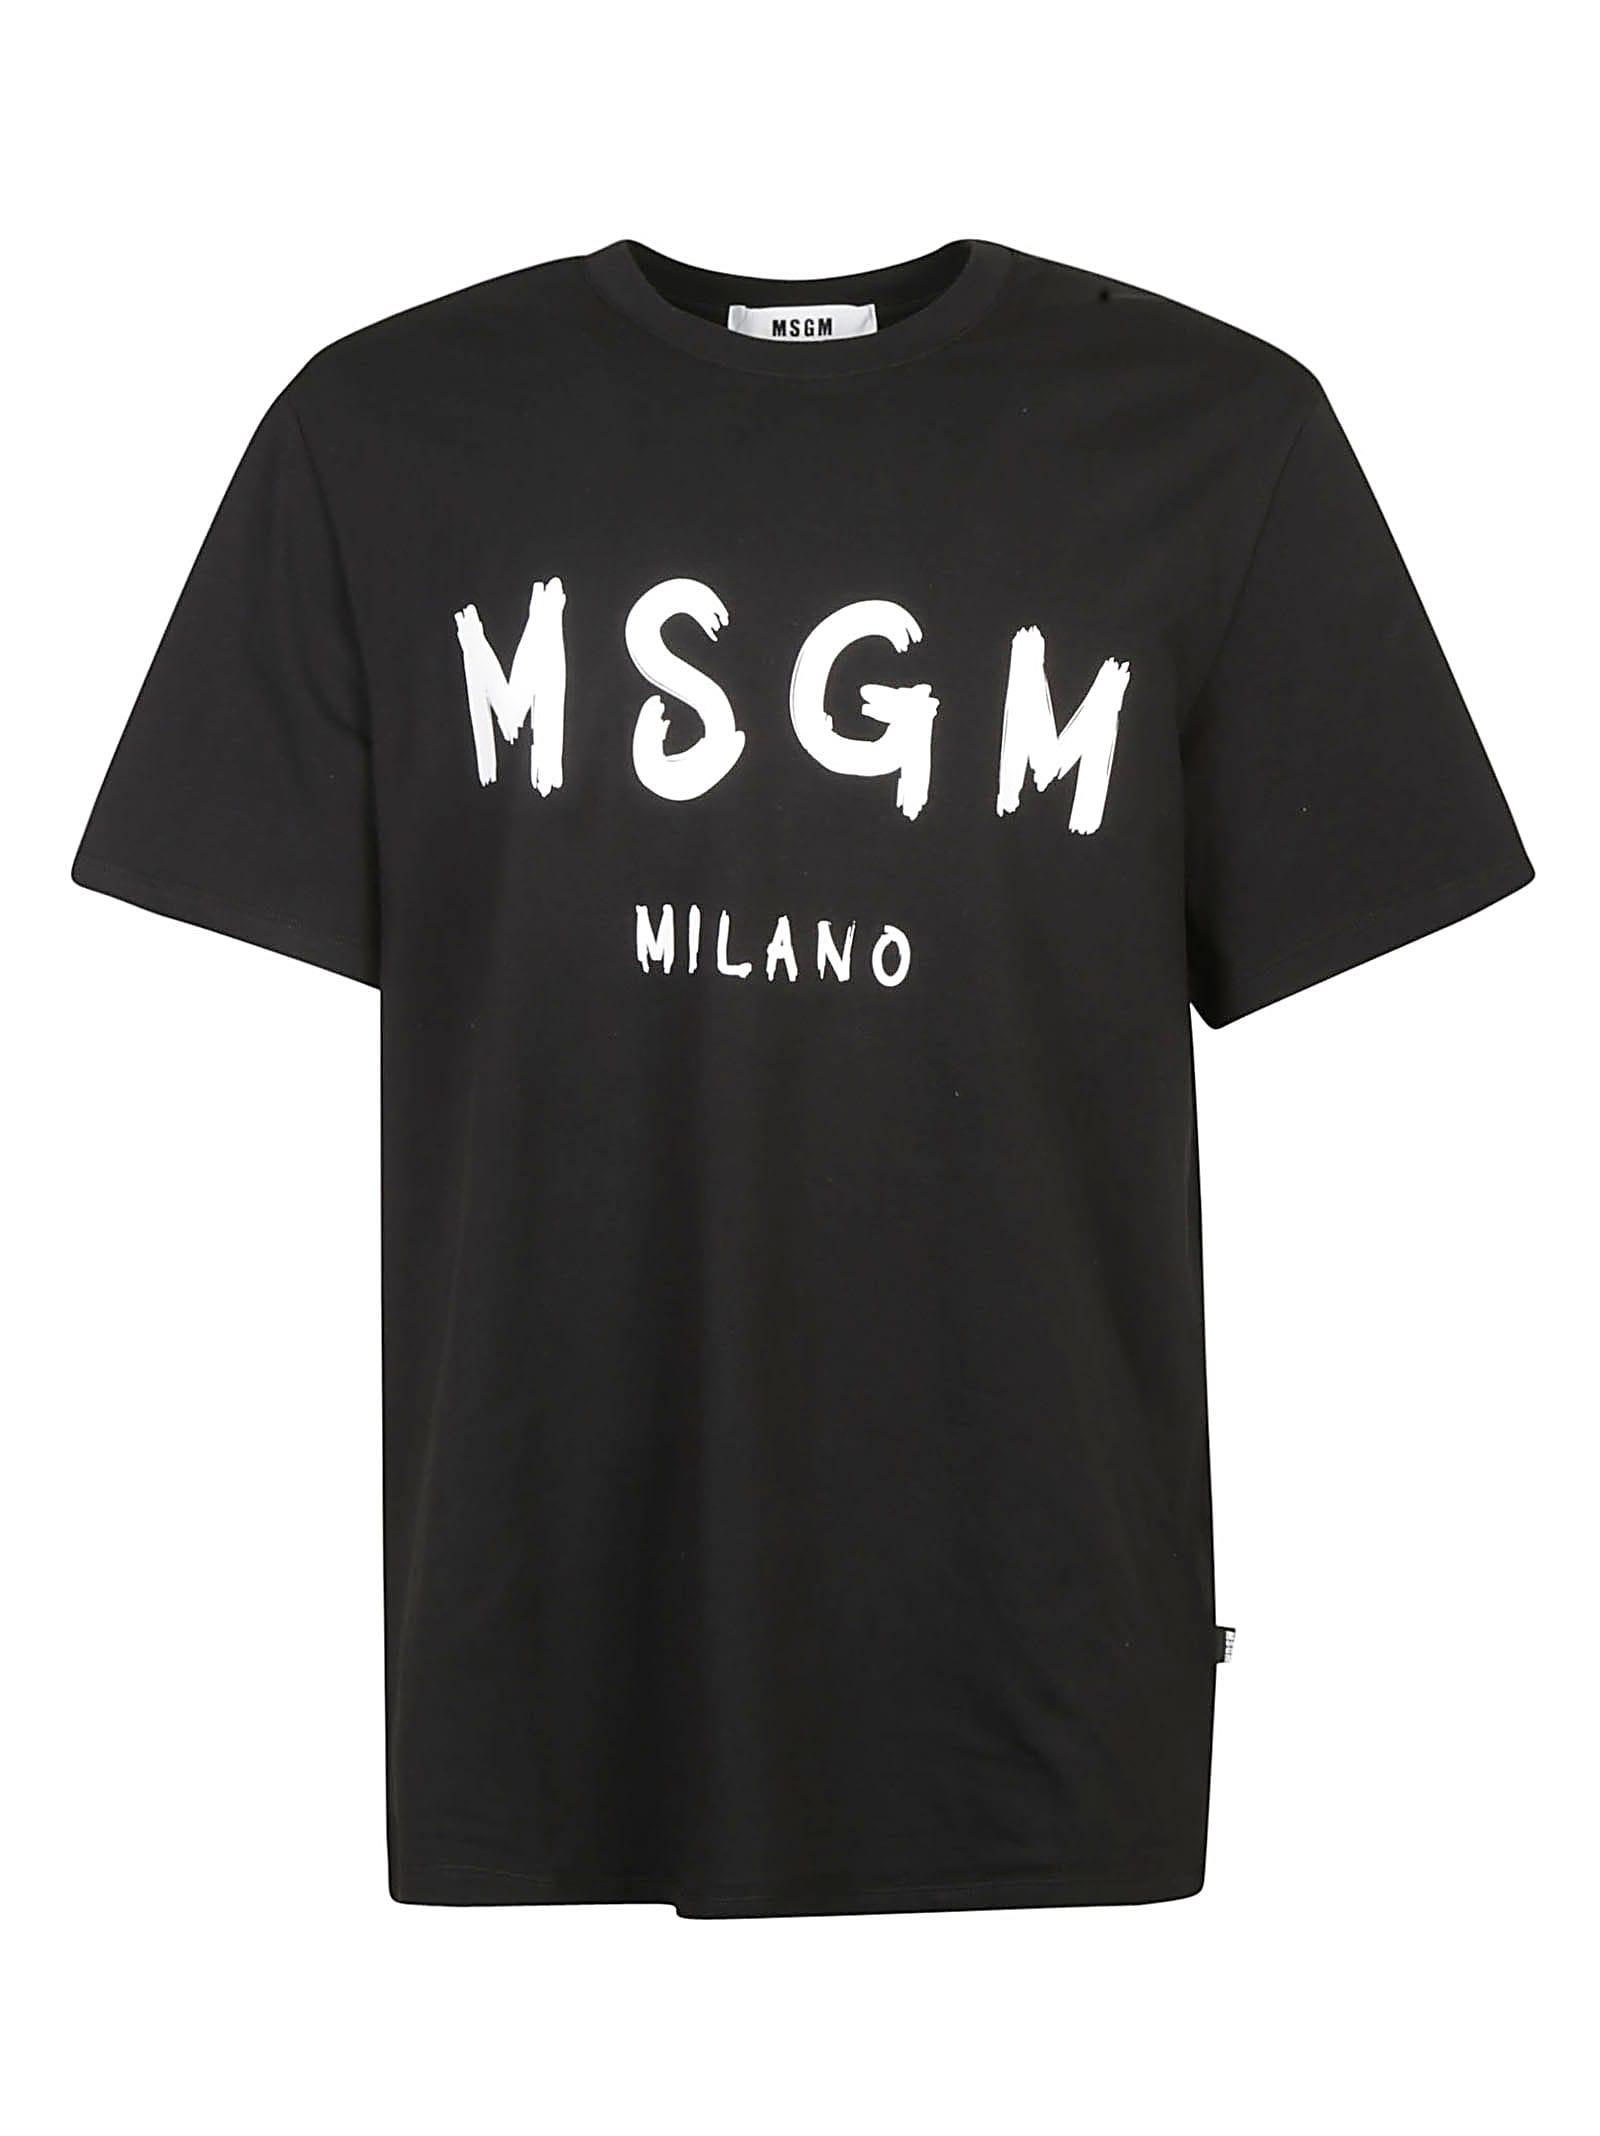 Msgm Cottons MILANO LOGO T-SHIRT